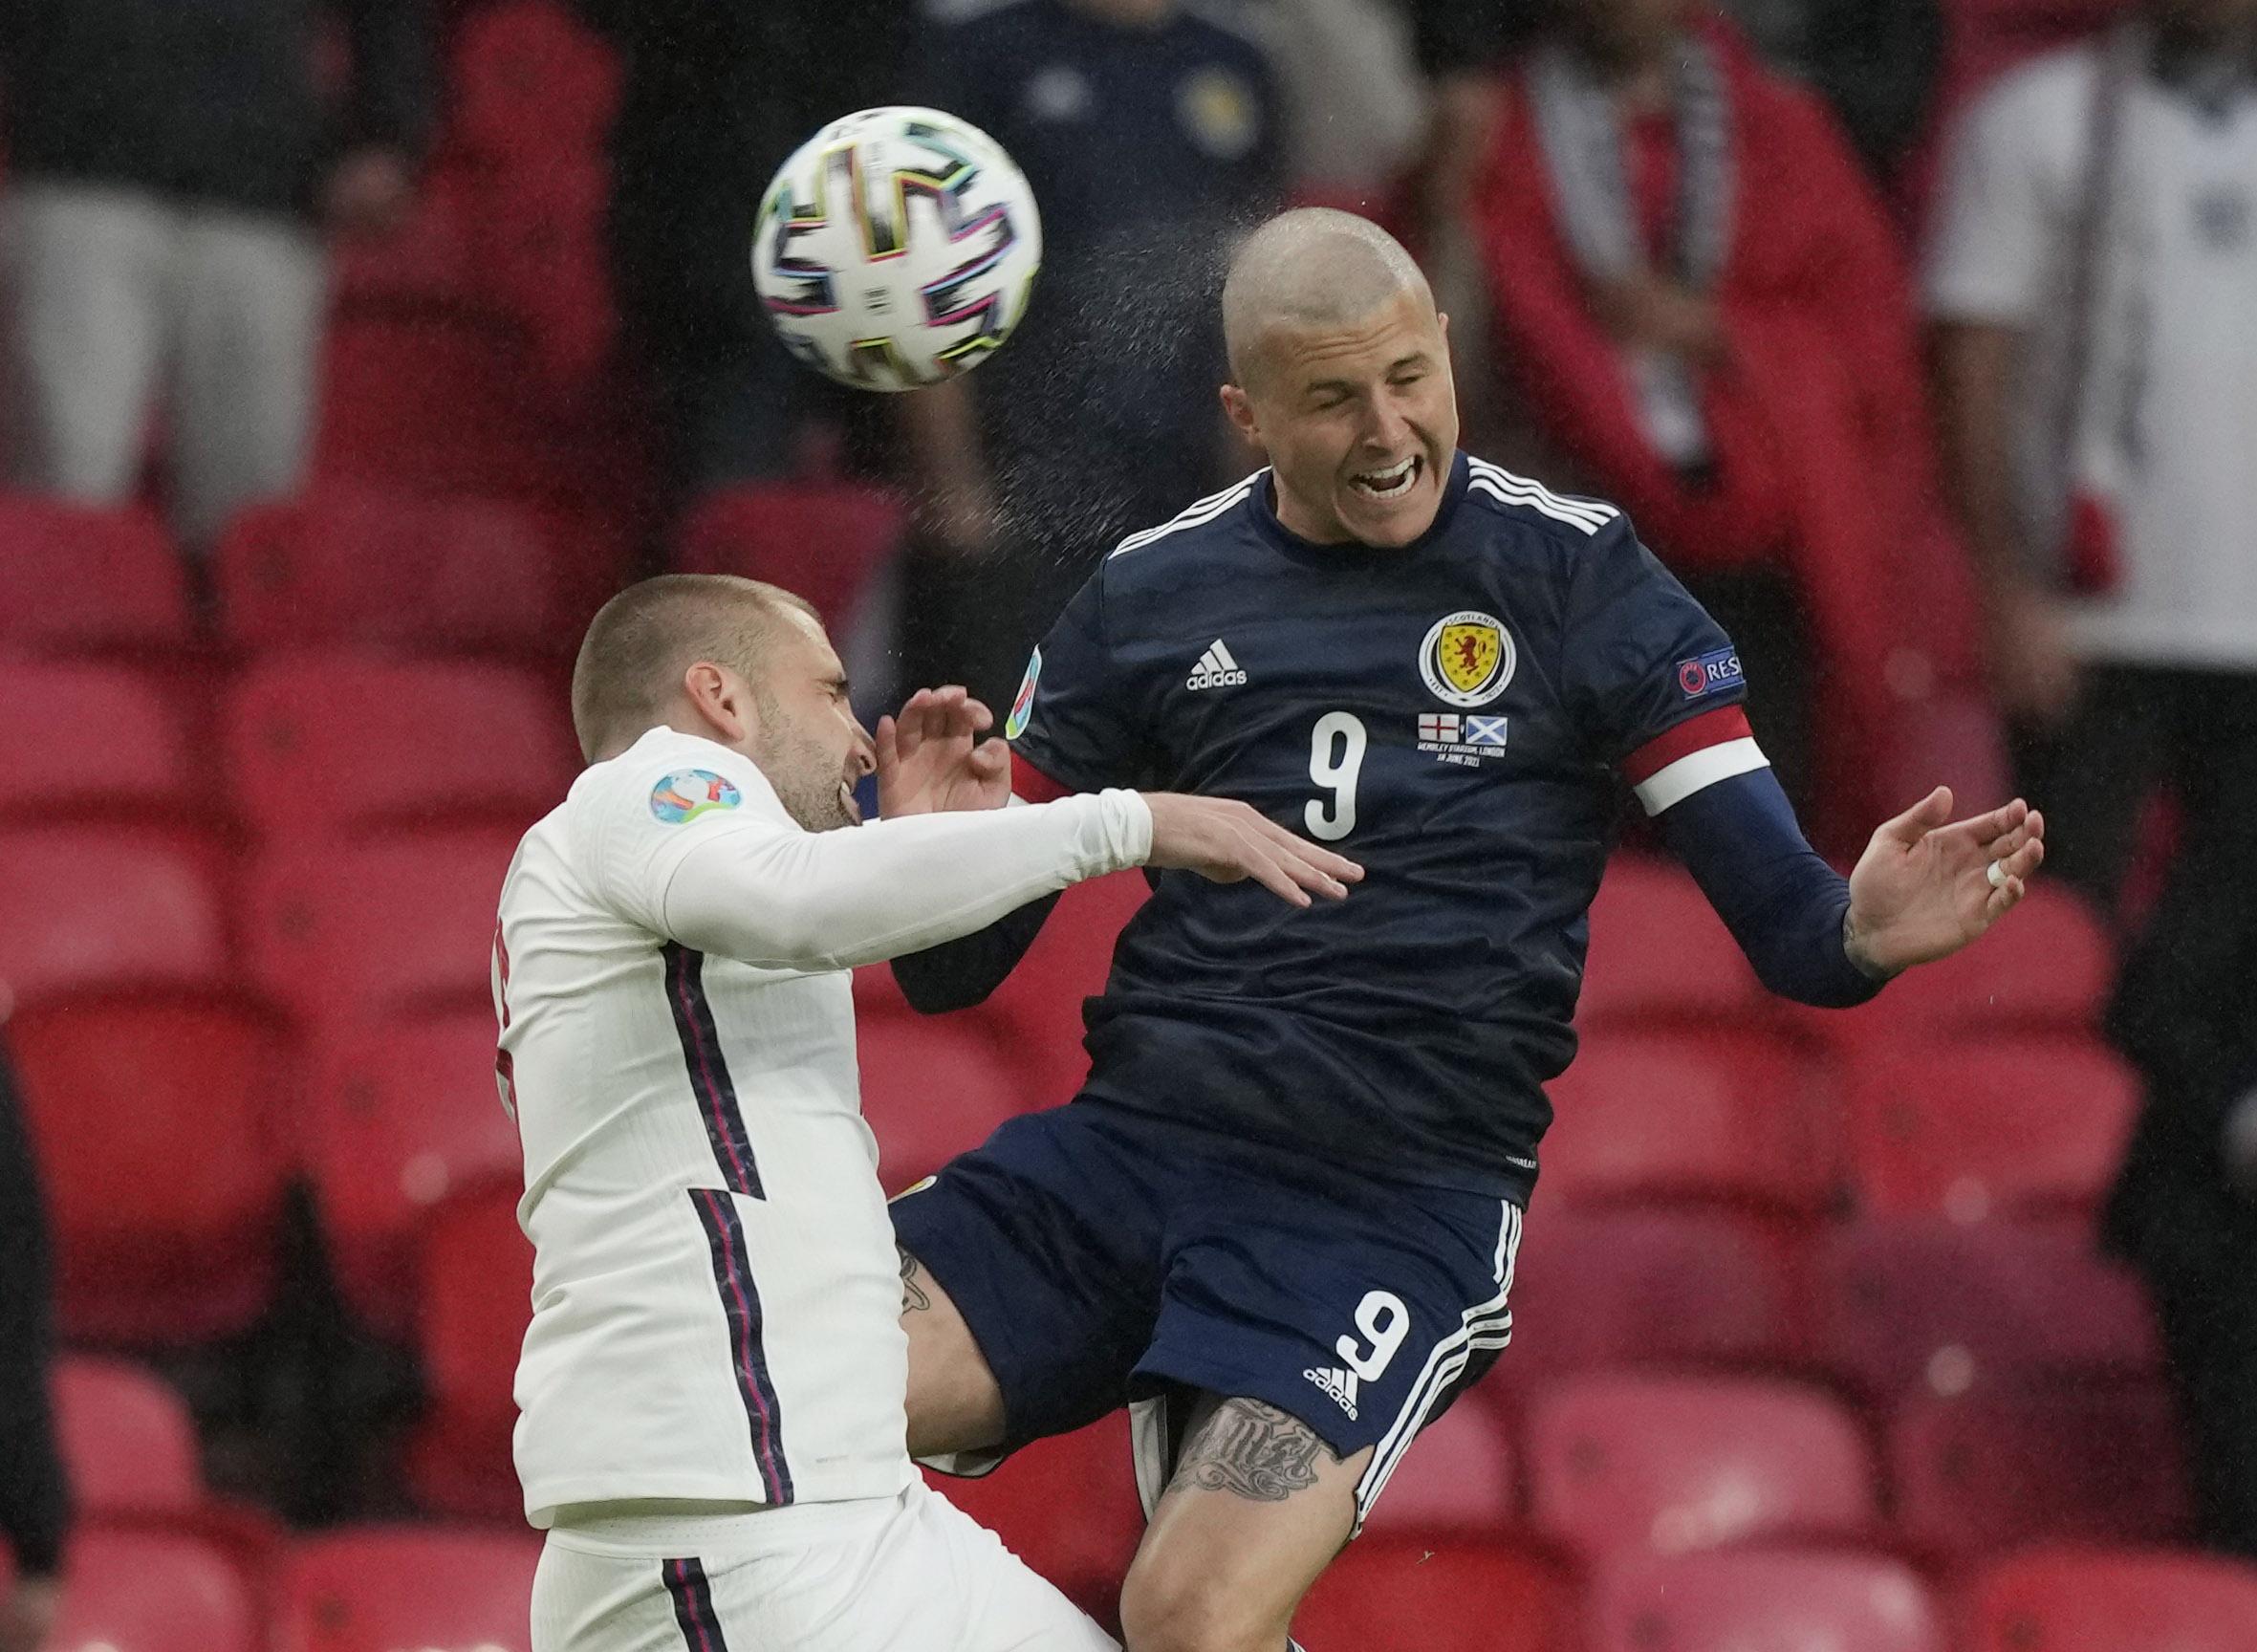 Euro 2020, Aγγλία – Σκωτία: «Μάχες» βγαλμένες από «κατς» στο πρώτο ημίχρονο